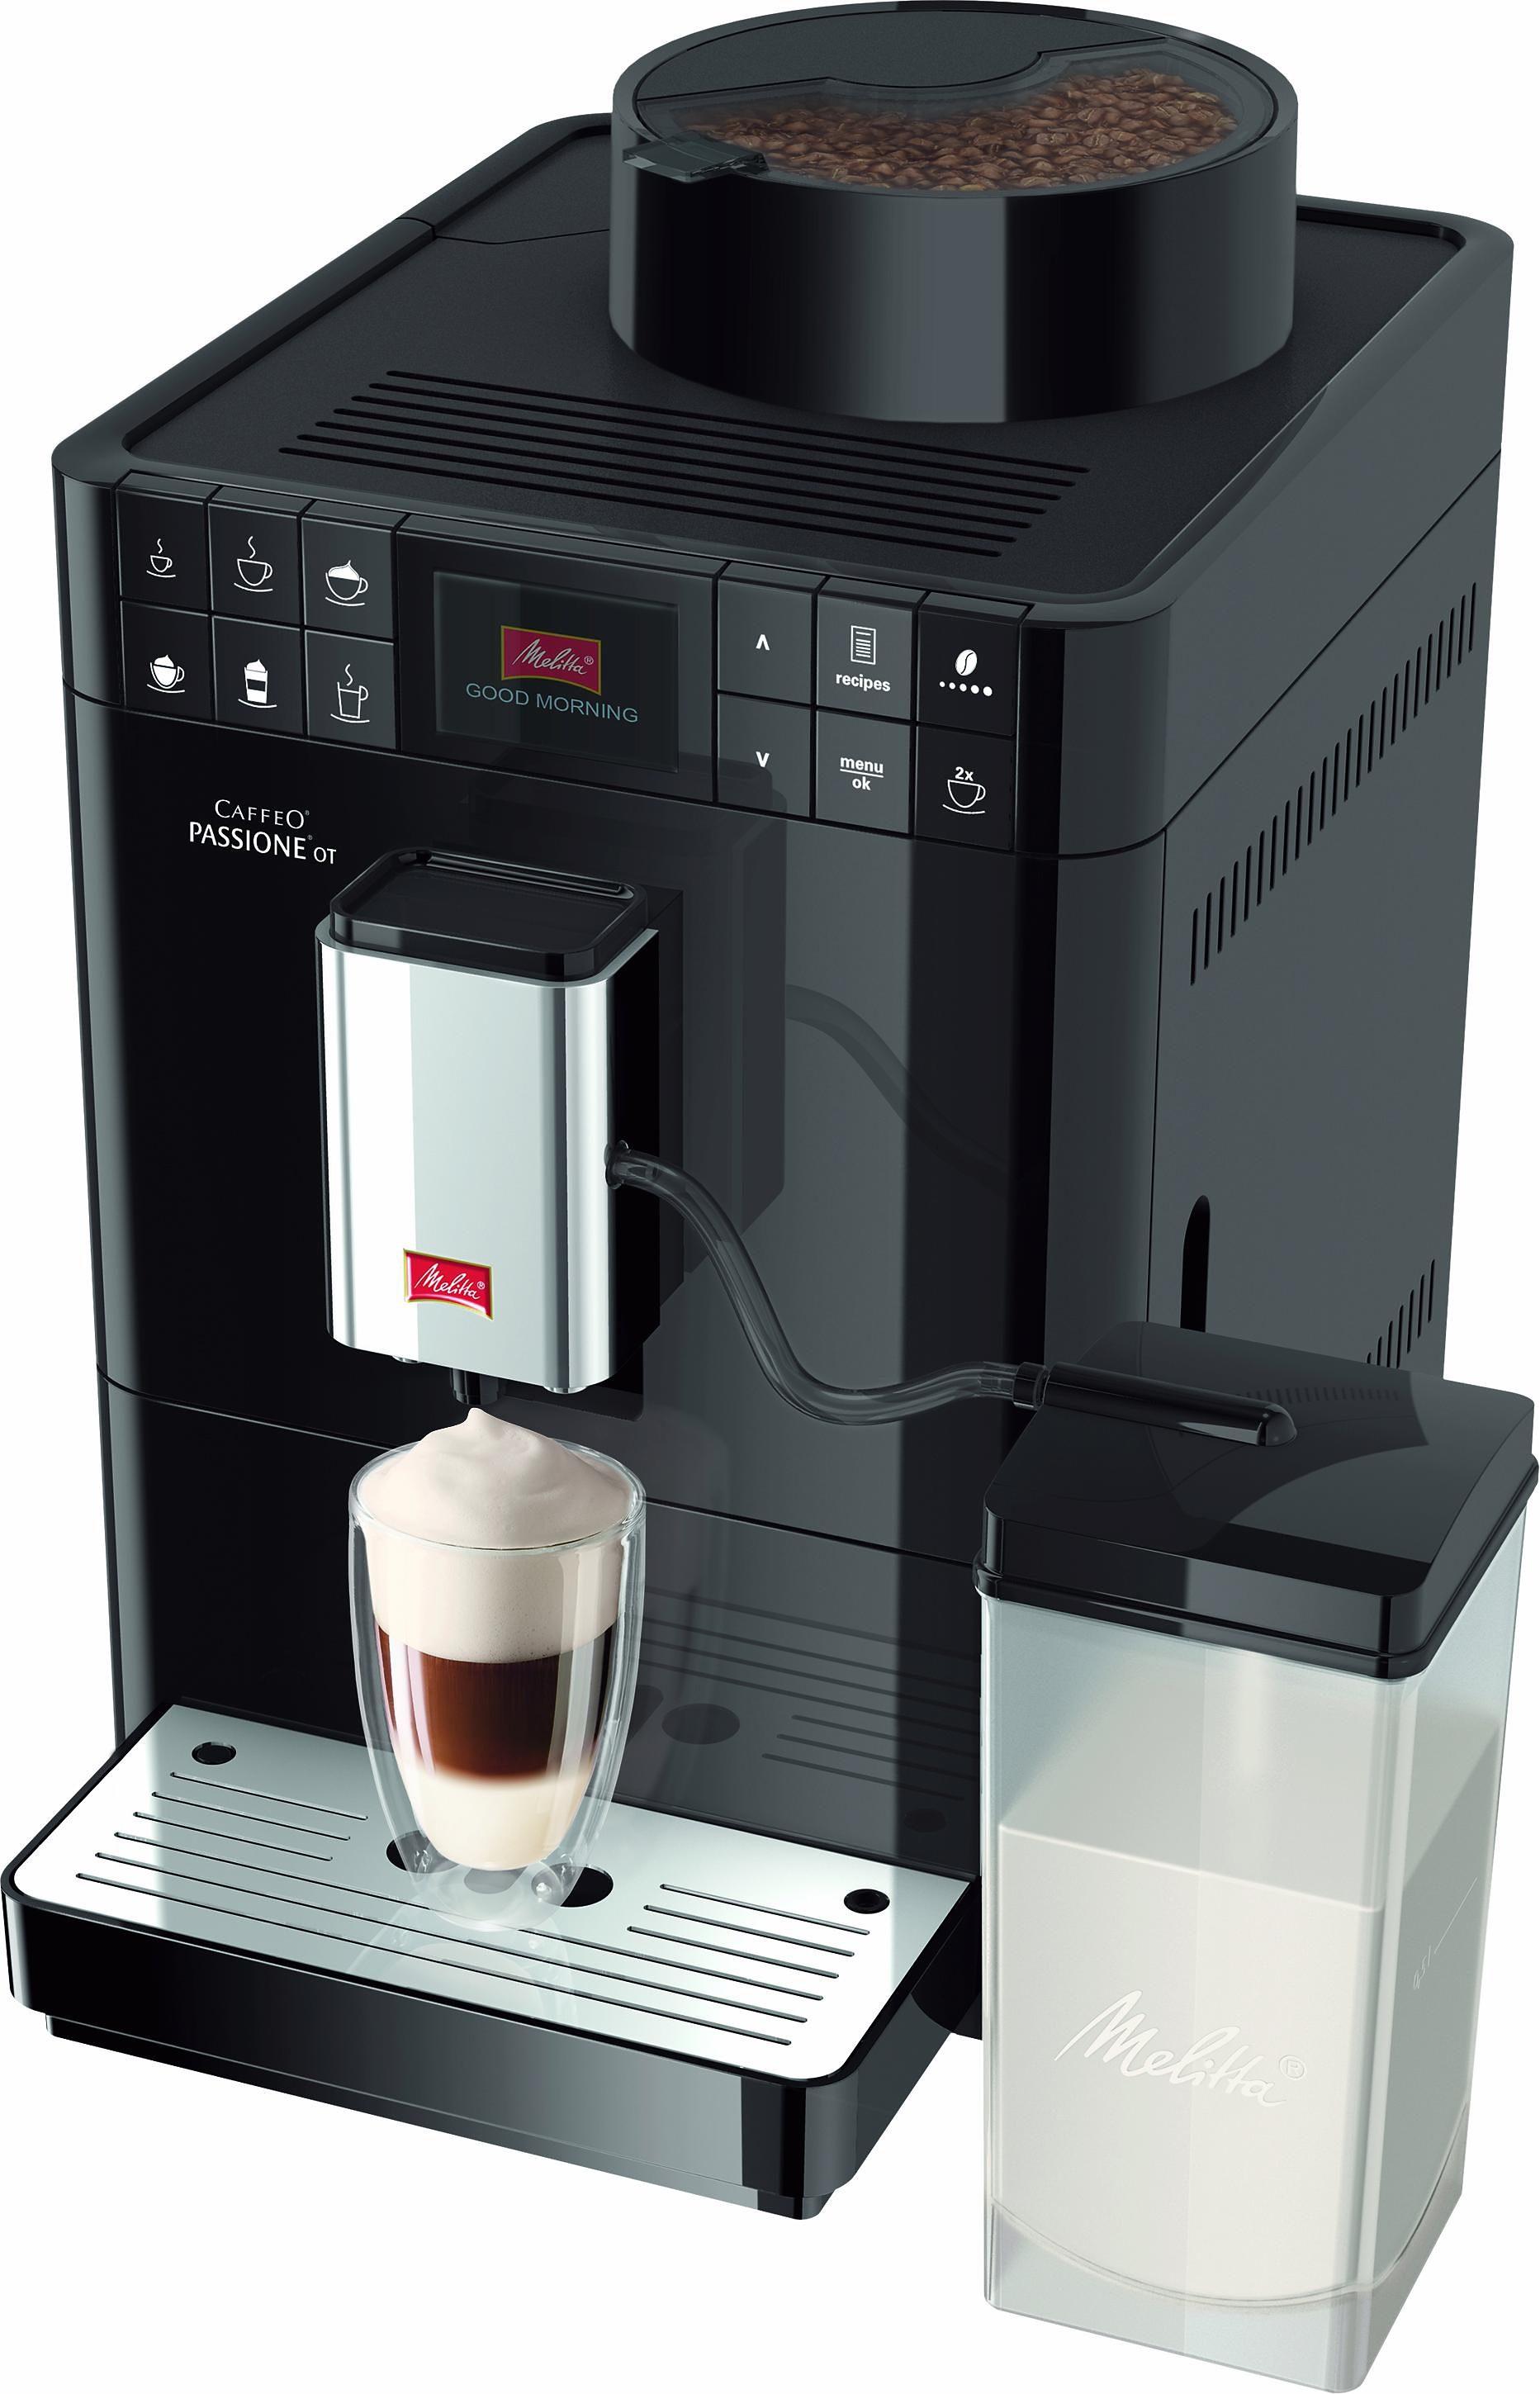 Melitta Kaffeevollautomat Caffeo® Passione® OT F53/1-102, 1, 2l Tank, Kegelmahlwerk   Küche und Esszimmer > Kaffee und Tee > Kaffeevollautomaten   Schwarz   Melitta